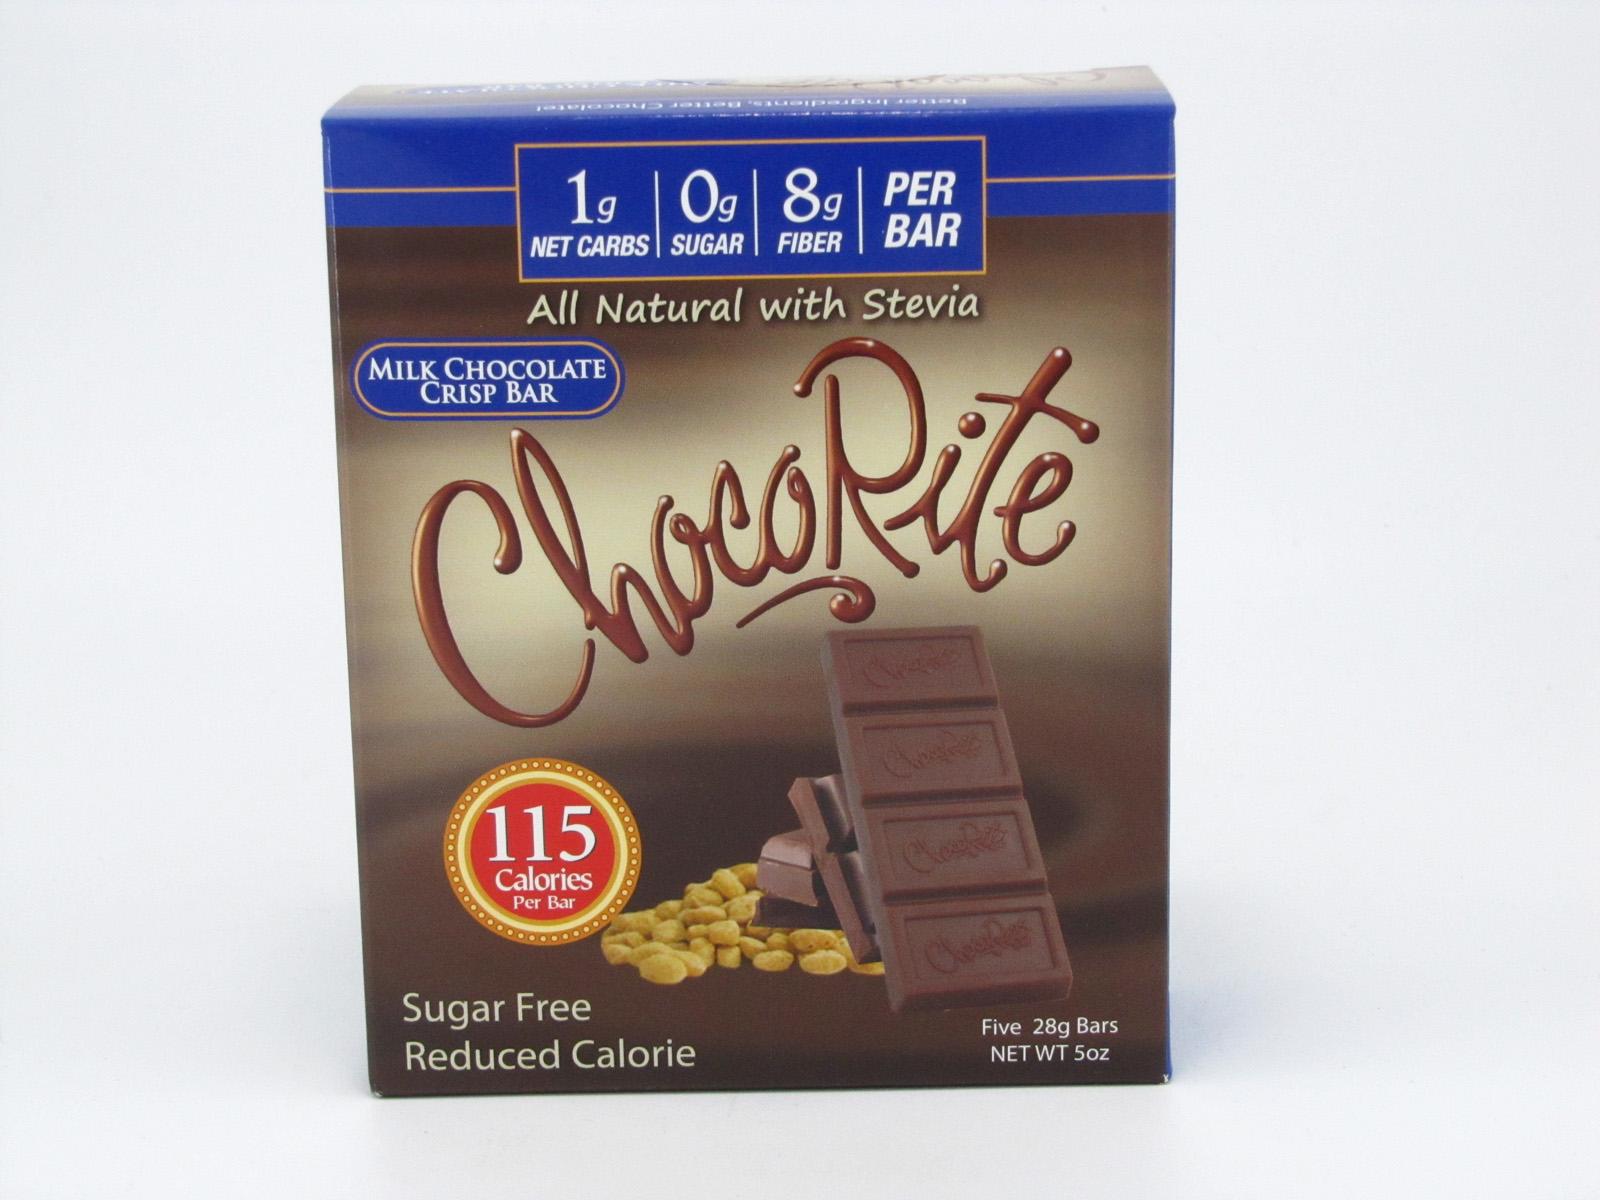 Chocorite Bar (Five 28g ) - Milk Chocolate Crisp - front view